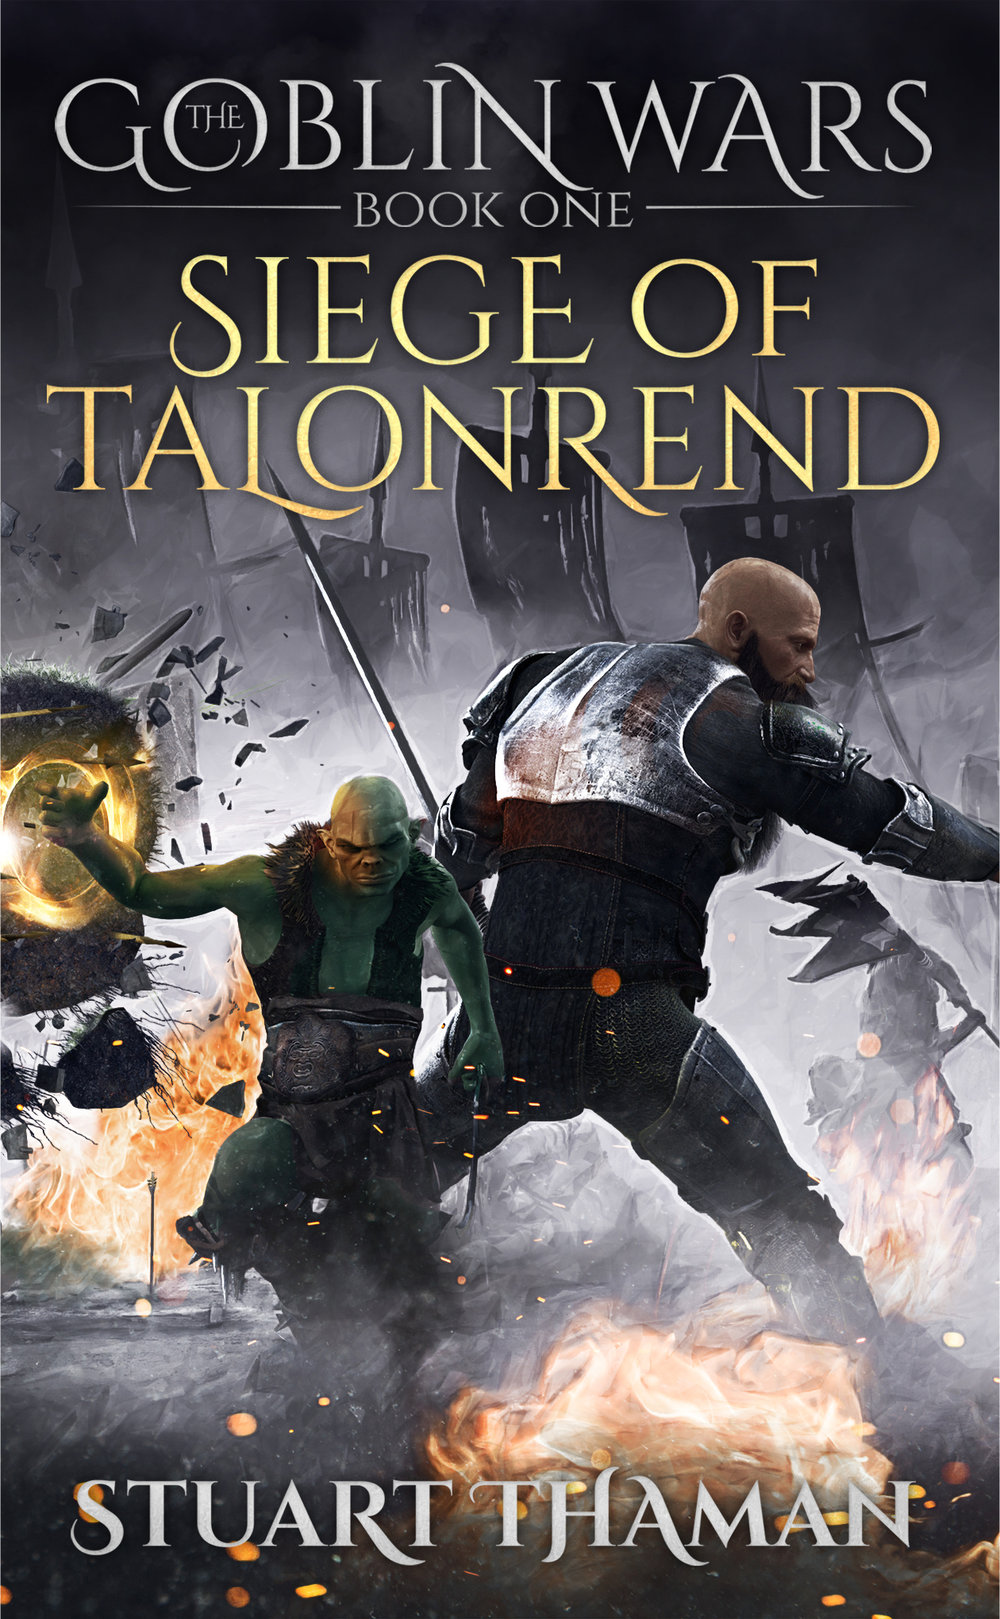 Copy of Siege of Talonrend